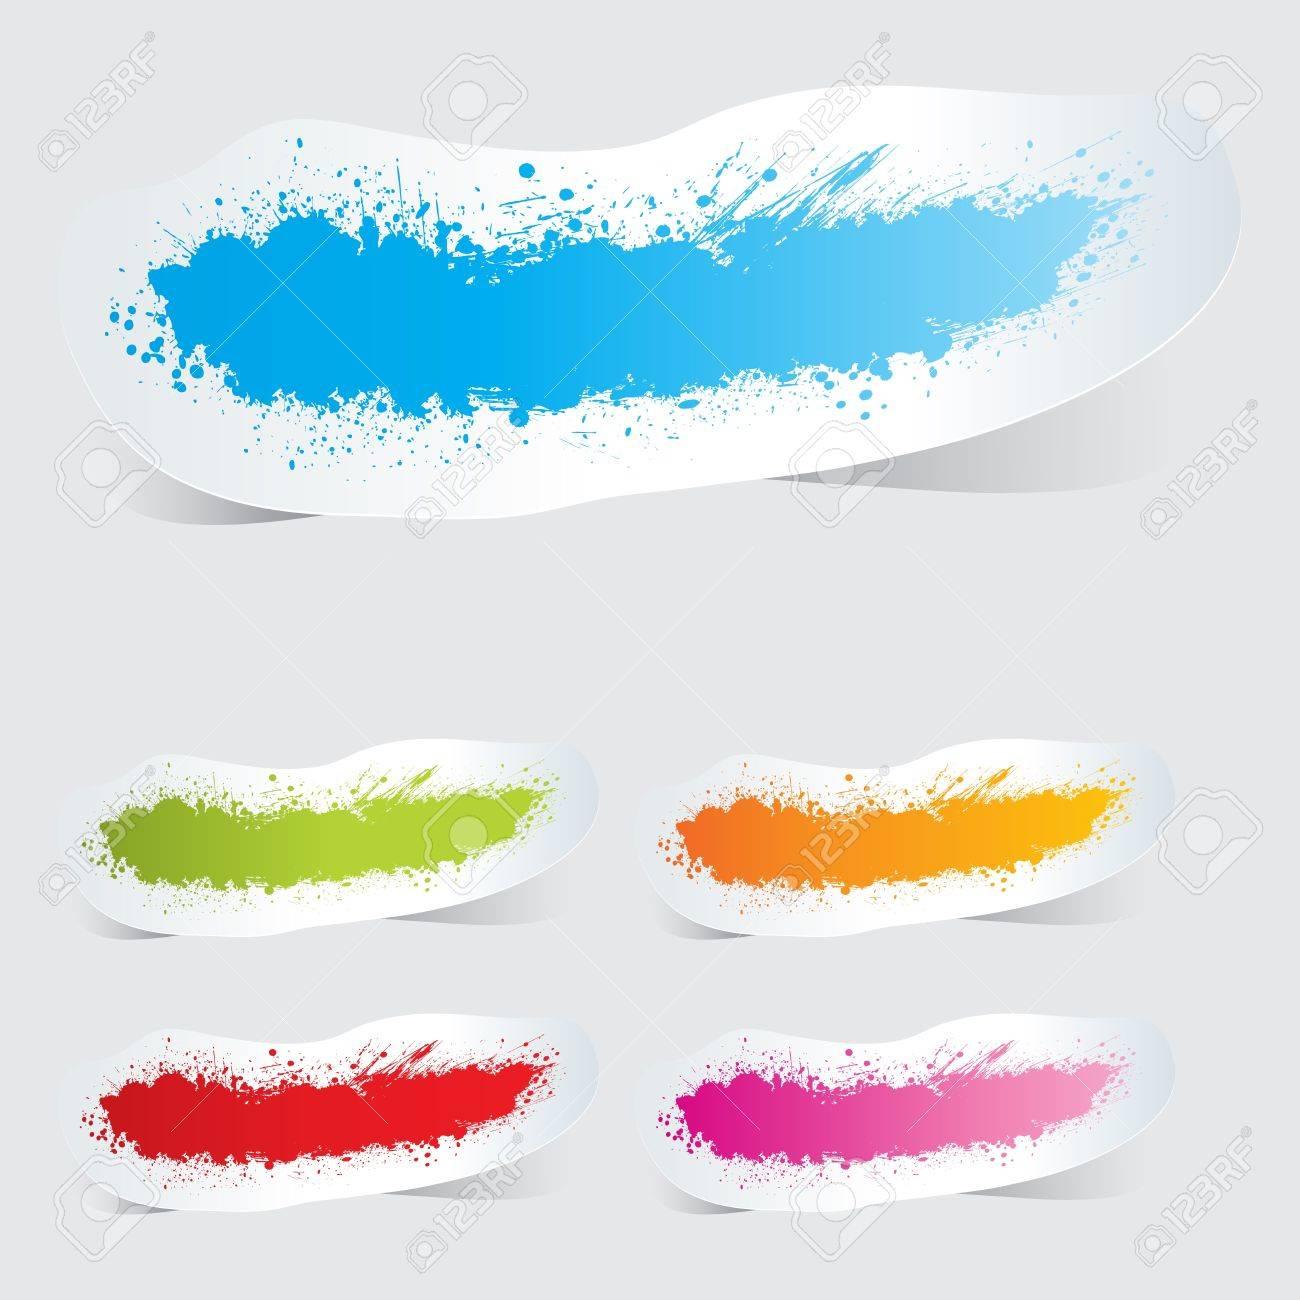 Colorful label paper grunge brush stroke Stock Vector - 15899047